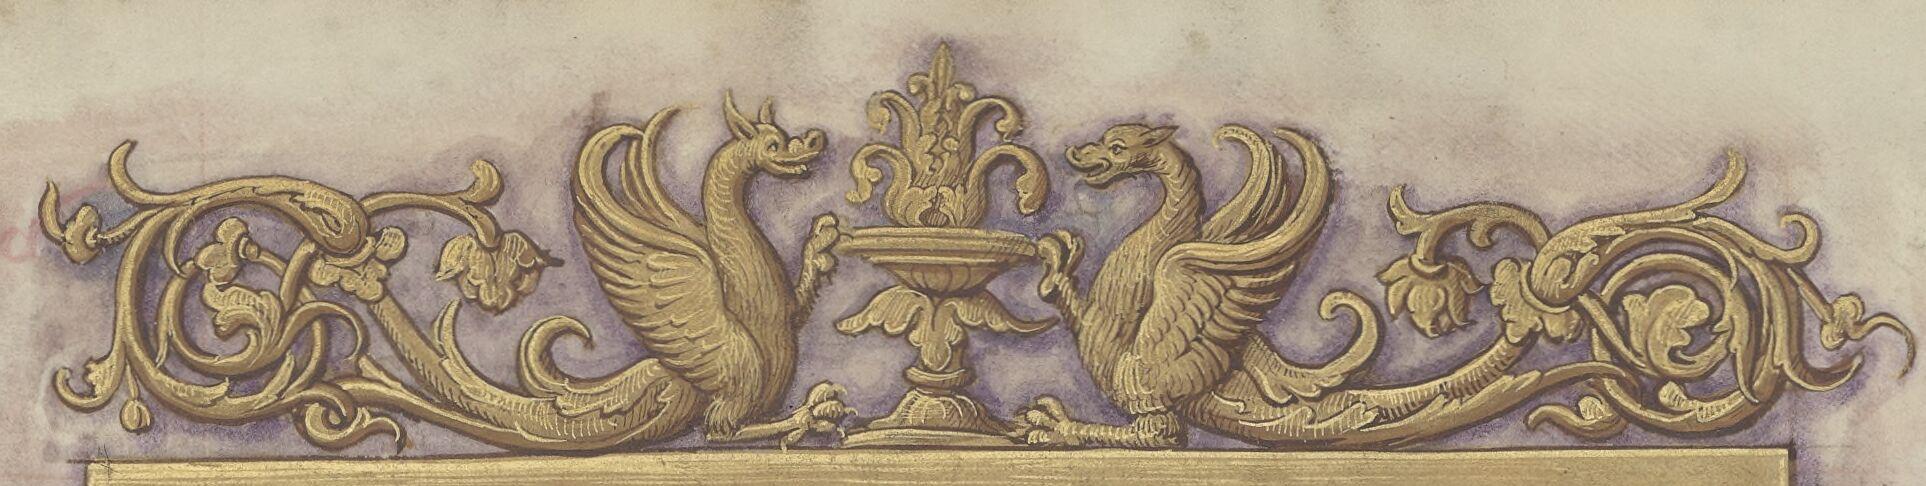 Dragon arabesques